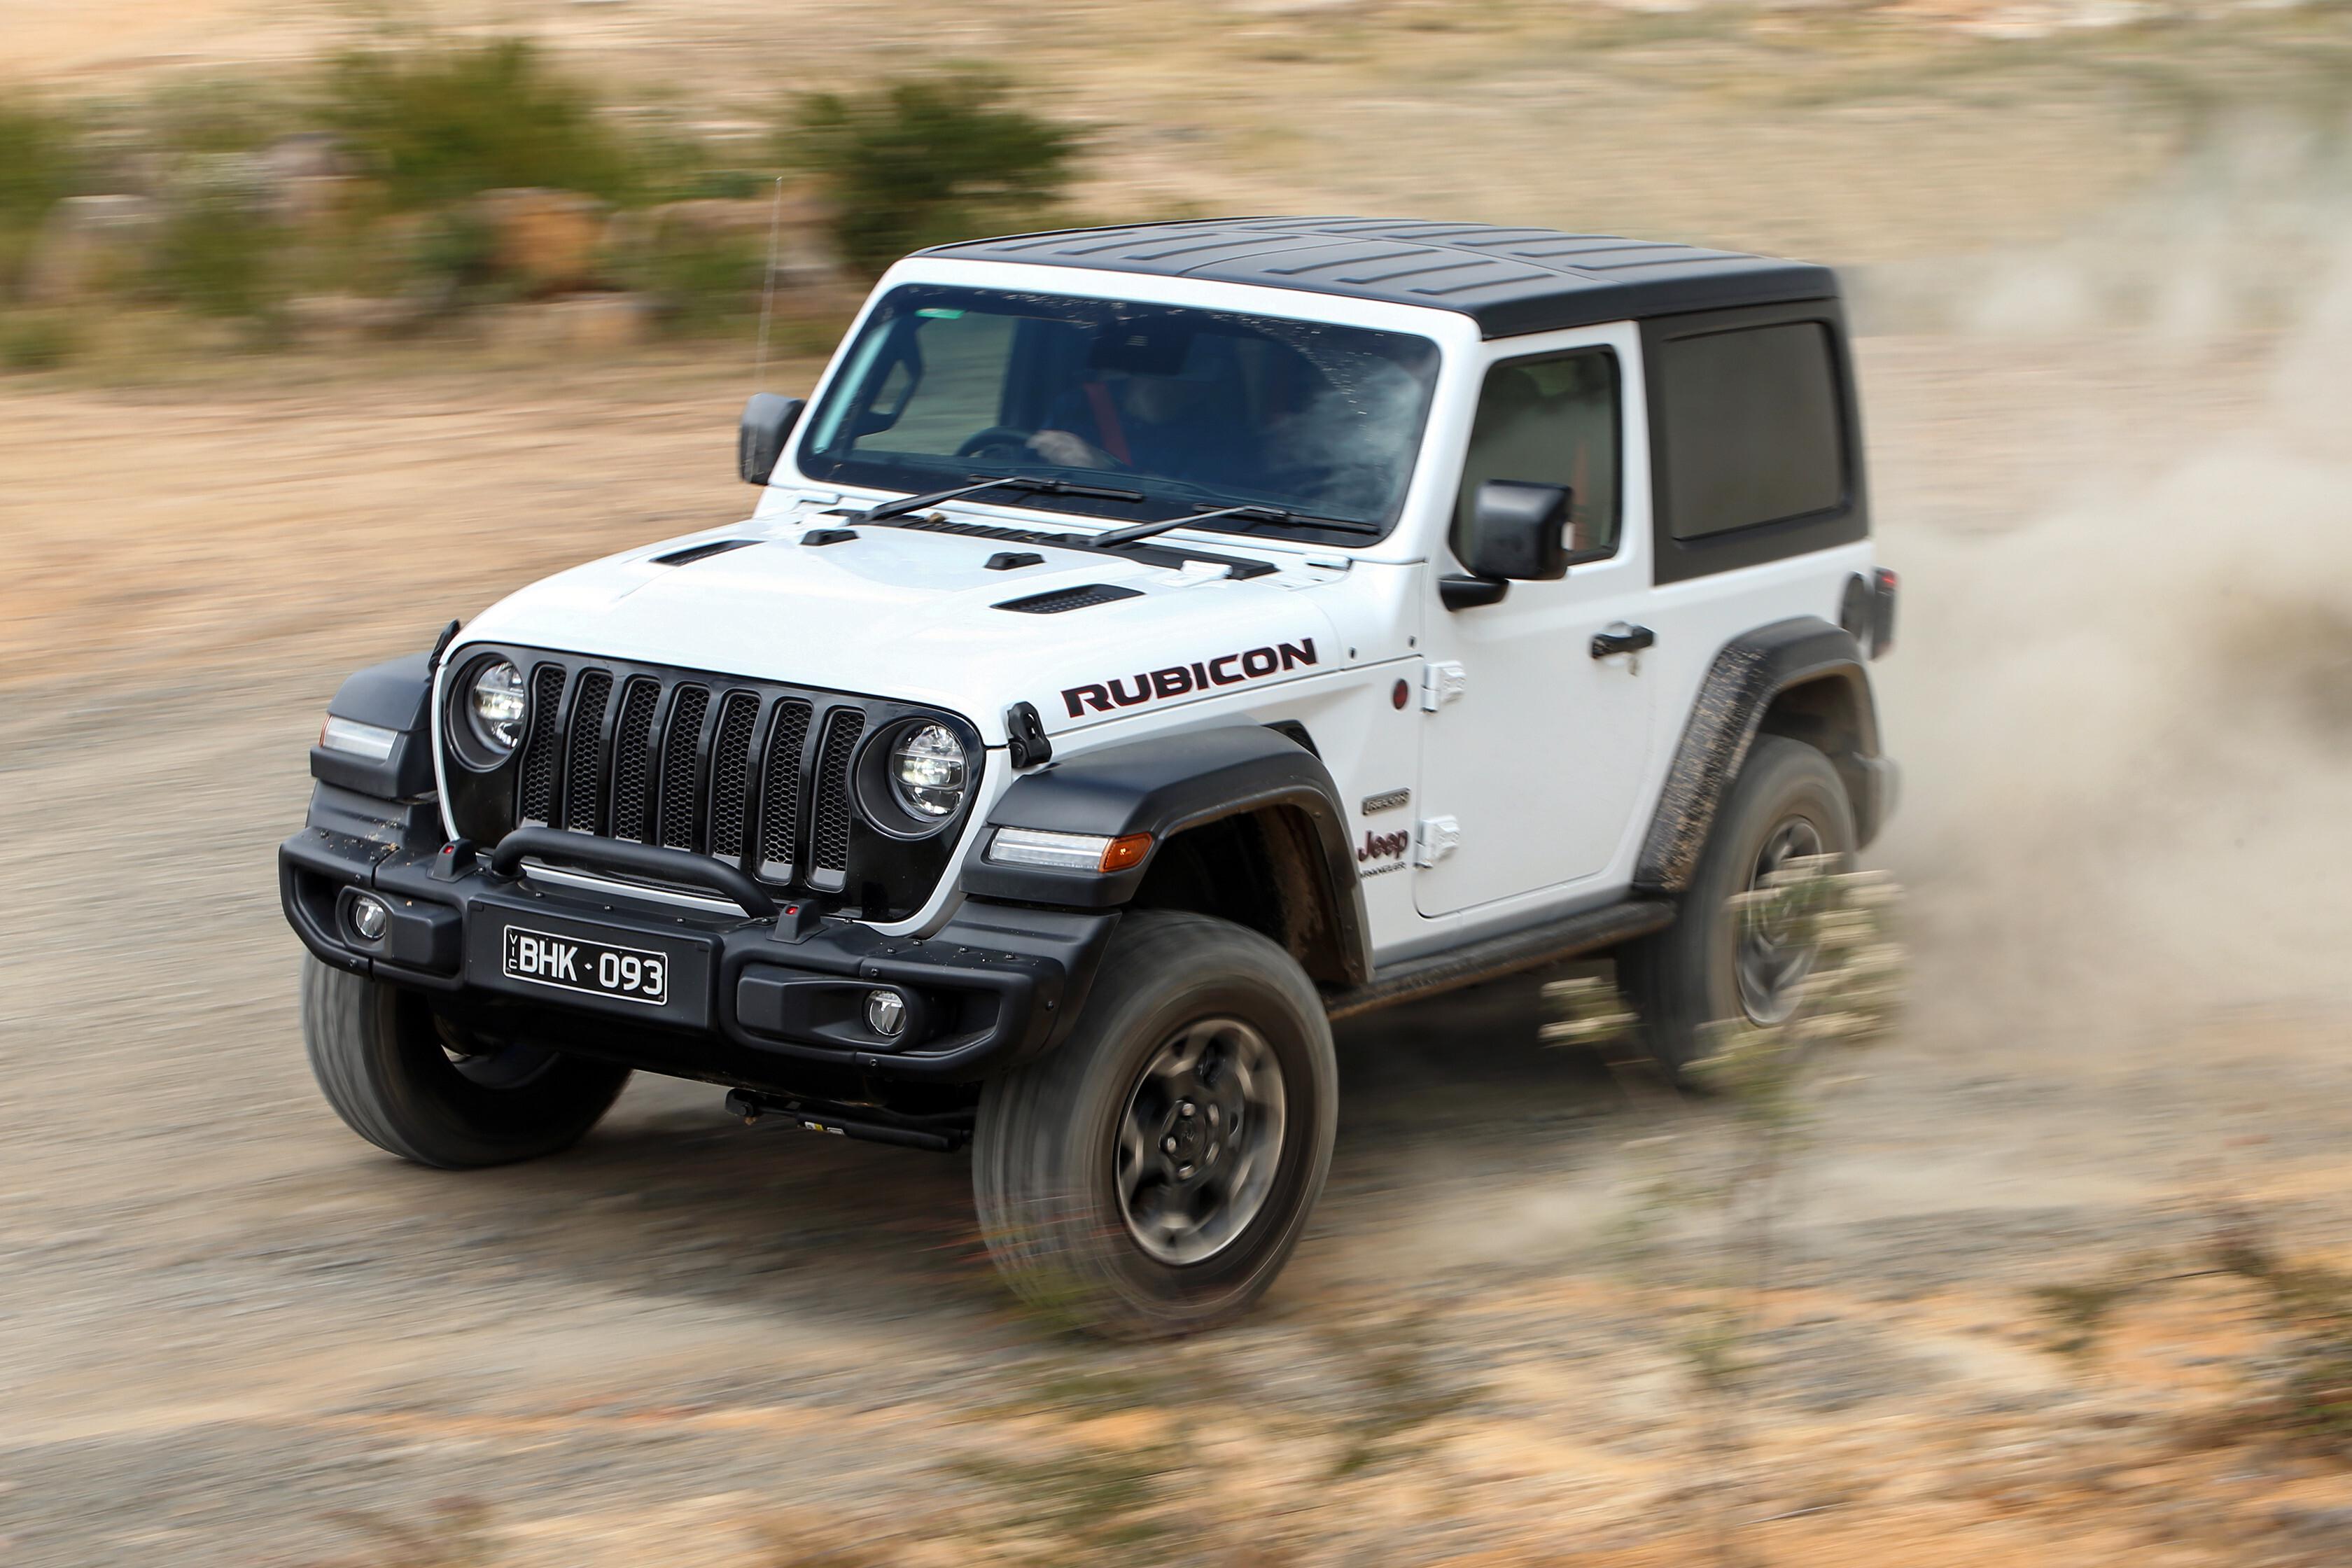 2021 Jeep Wrangler Rubicon Recon review drive